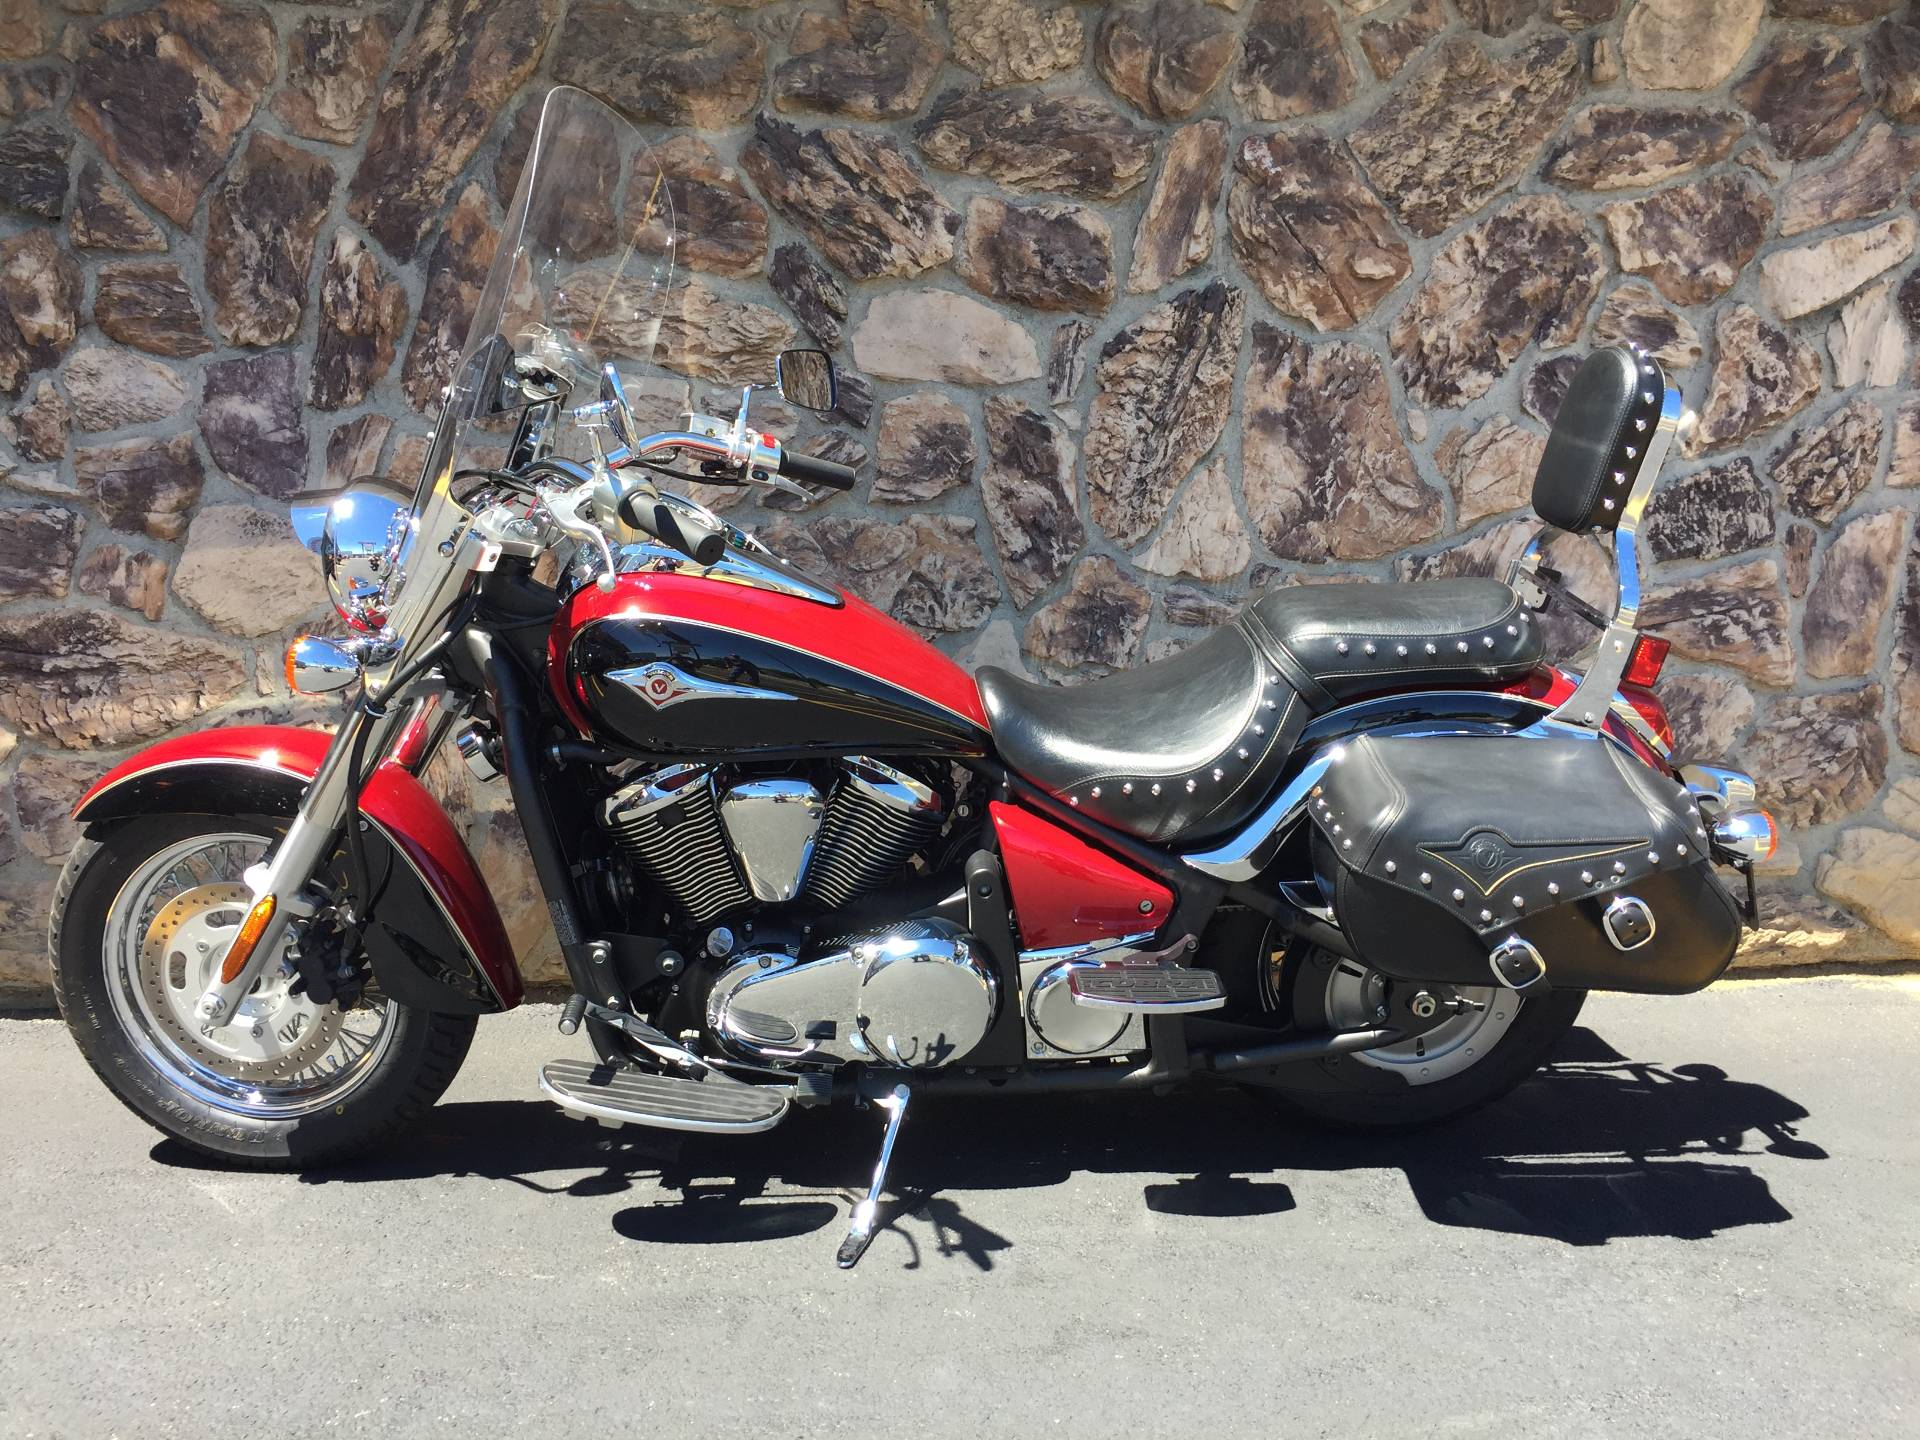 Used 2008 Kawasaki Vulcan® 900 Classic LT Motorcycles in Aurora, IL ...